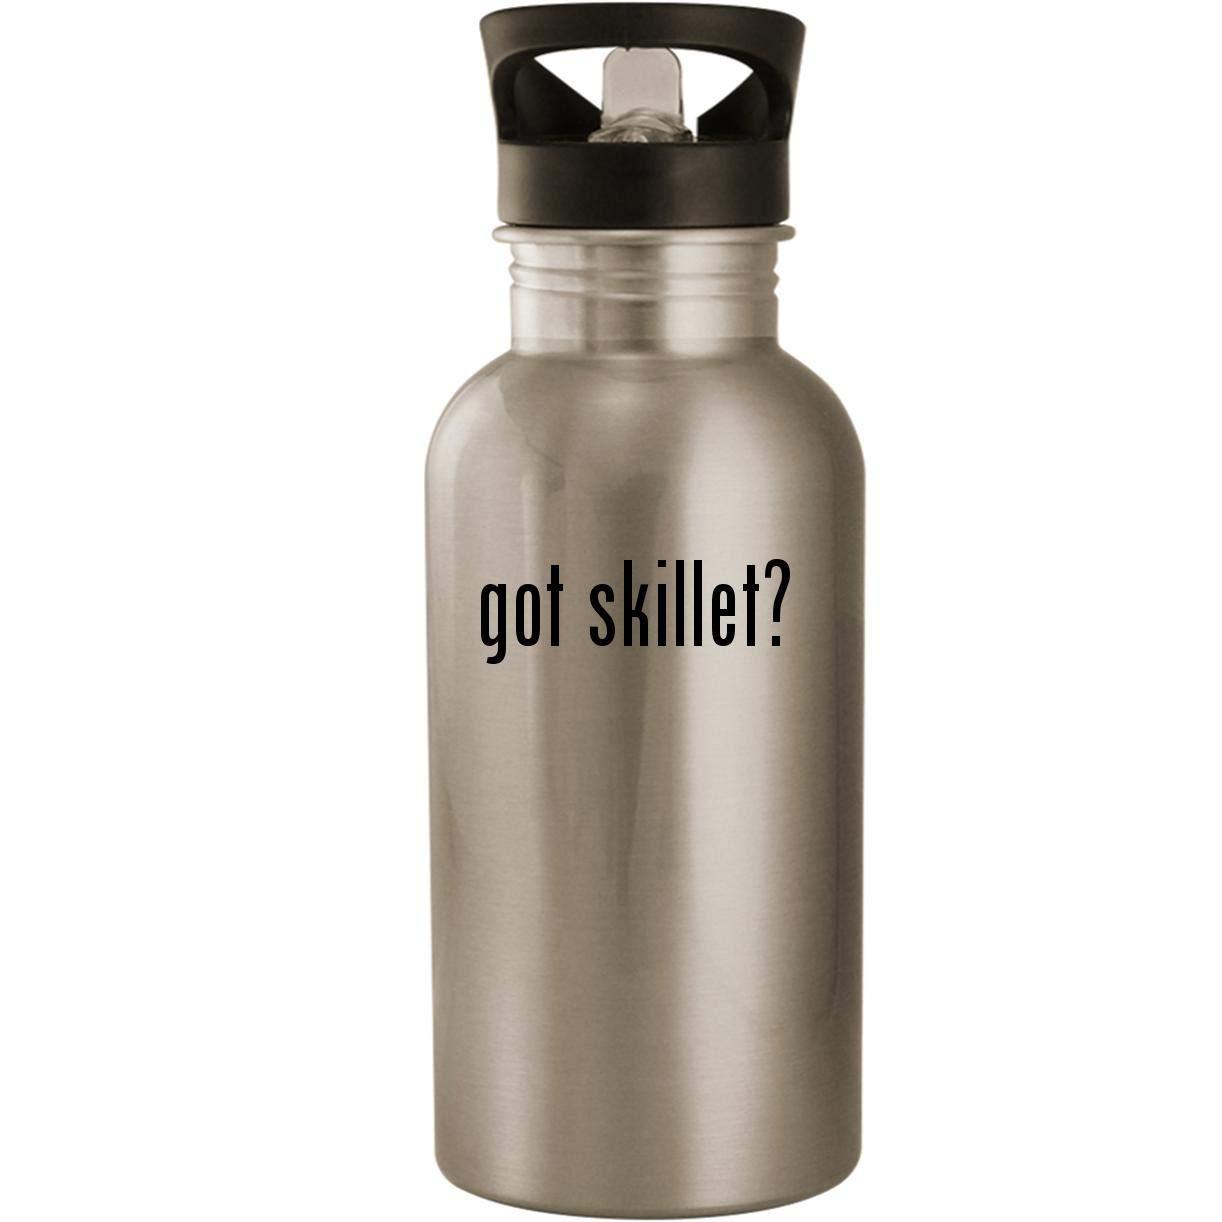 got skillet - ステンレススチール製20オンスのロード対応ウォーターボトル。 シルバー US-C-07-18-01-052977-04-26-18-26 B07GN91TLH シルバー